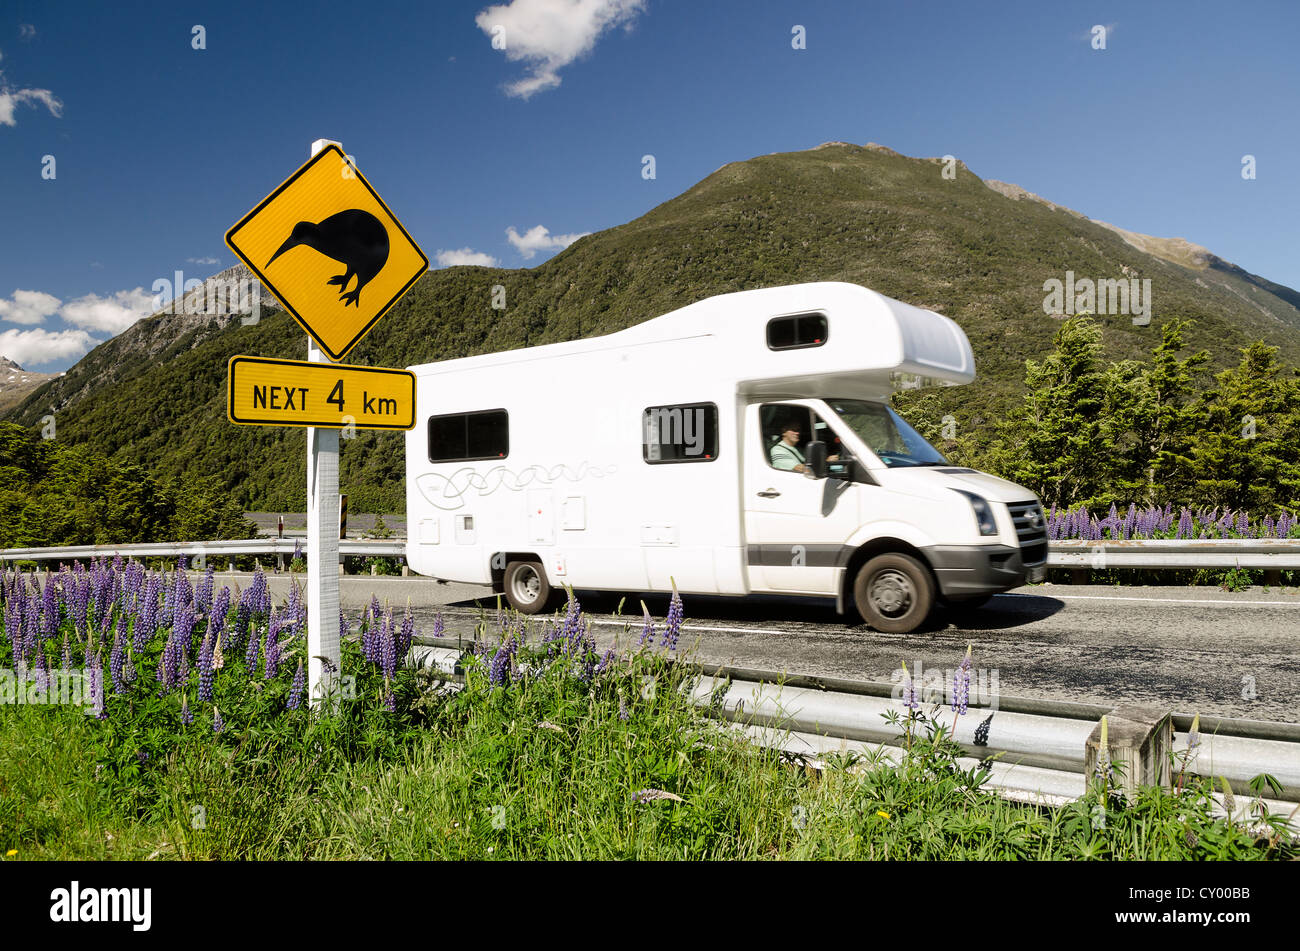 Campervan driving past a warning sign on a highway, 'Kiwis next 4 km', Porters Pass, Craigieburn Range, - Stock Image